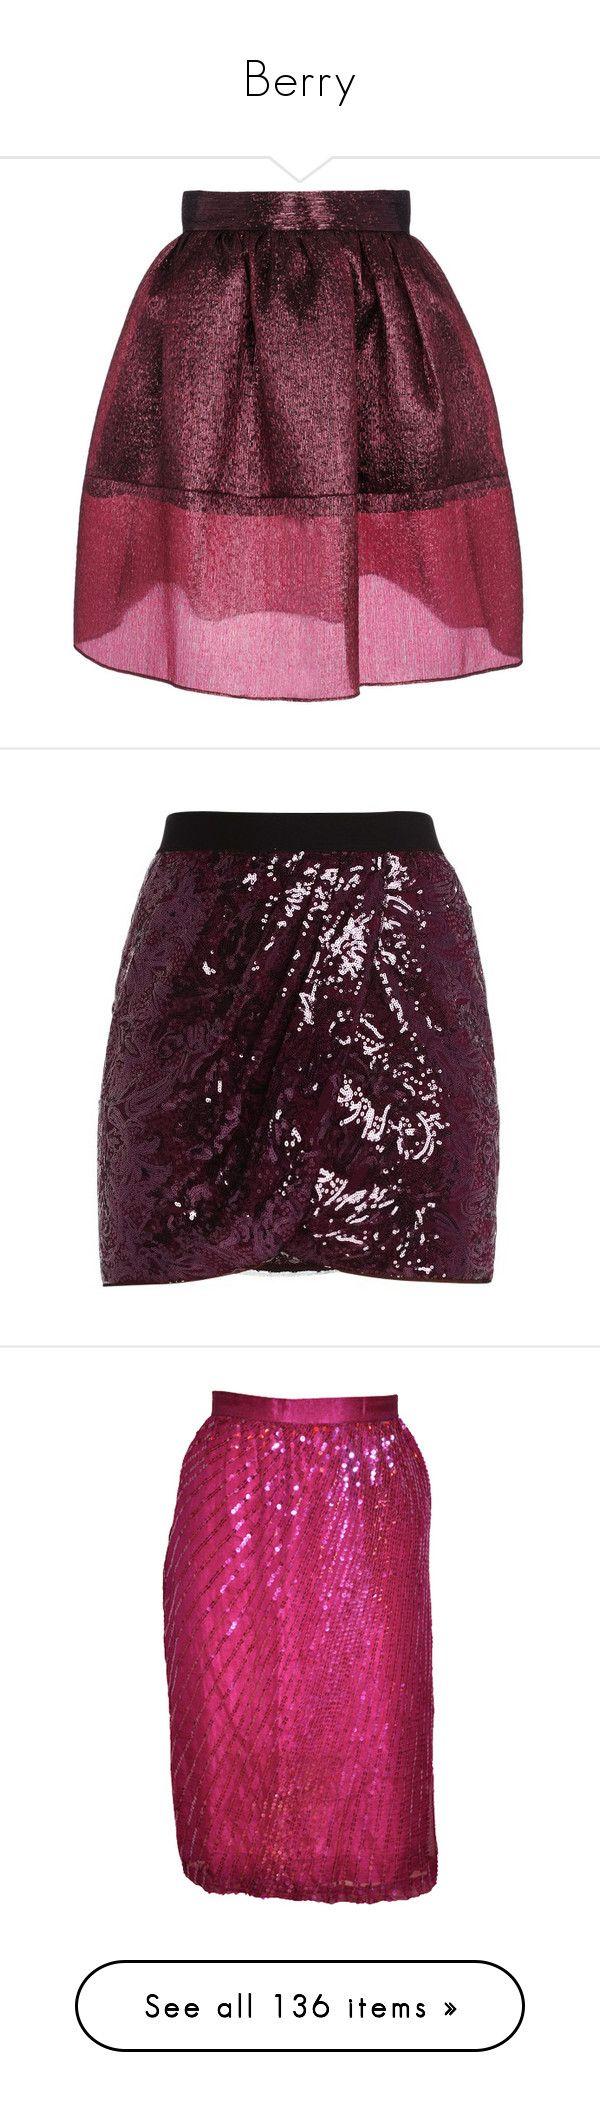 """Berry"" by pinkandgoldsparkles ❤ liked on Polyvore featuring skirts, bottoms, saias, faldas, maroon, silk skirt, purple skirt, knee high skirts, purple ruffle skirt y golden goose"